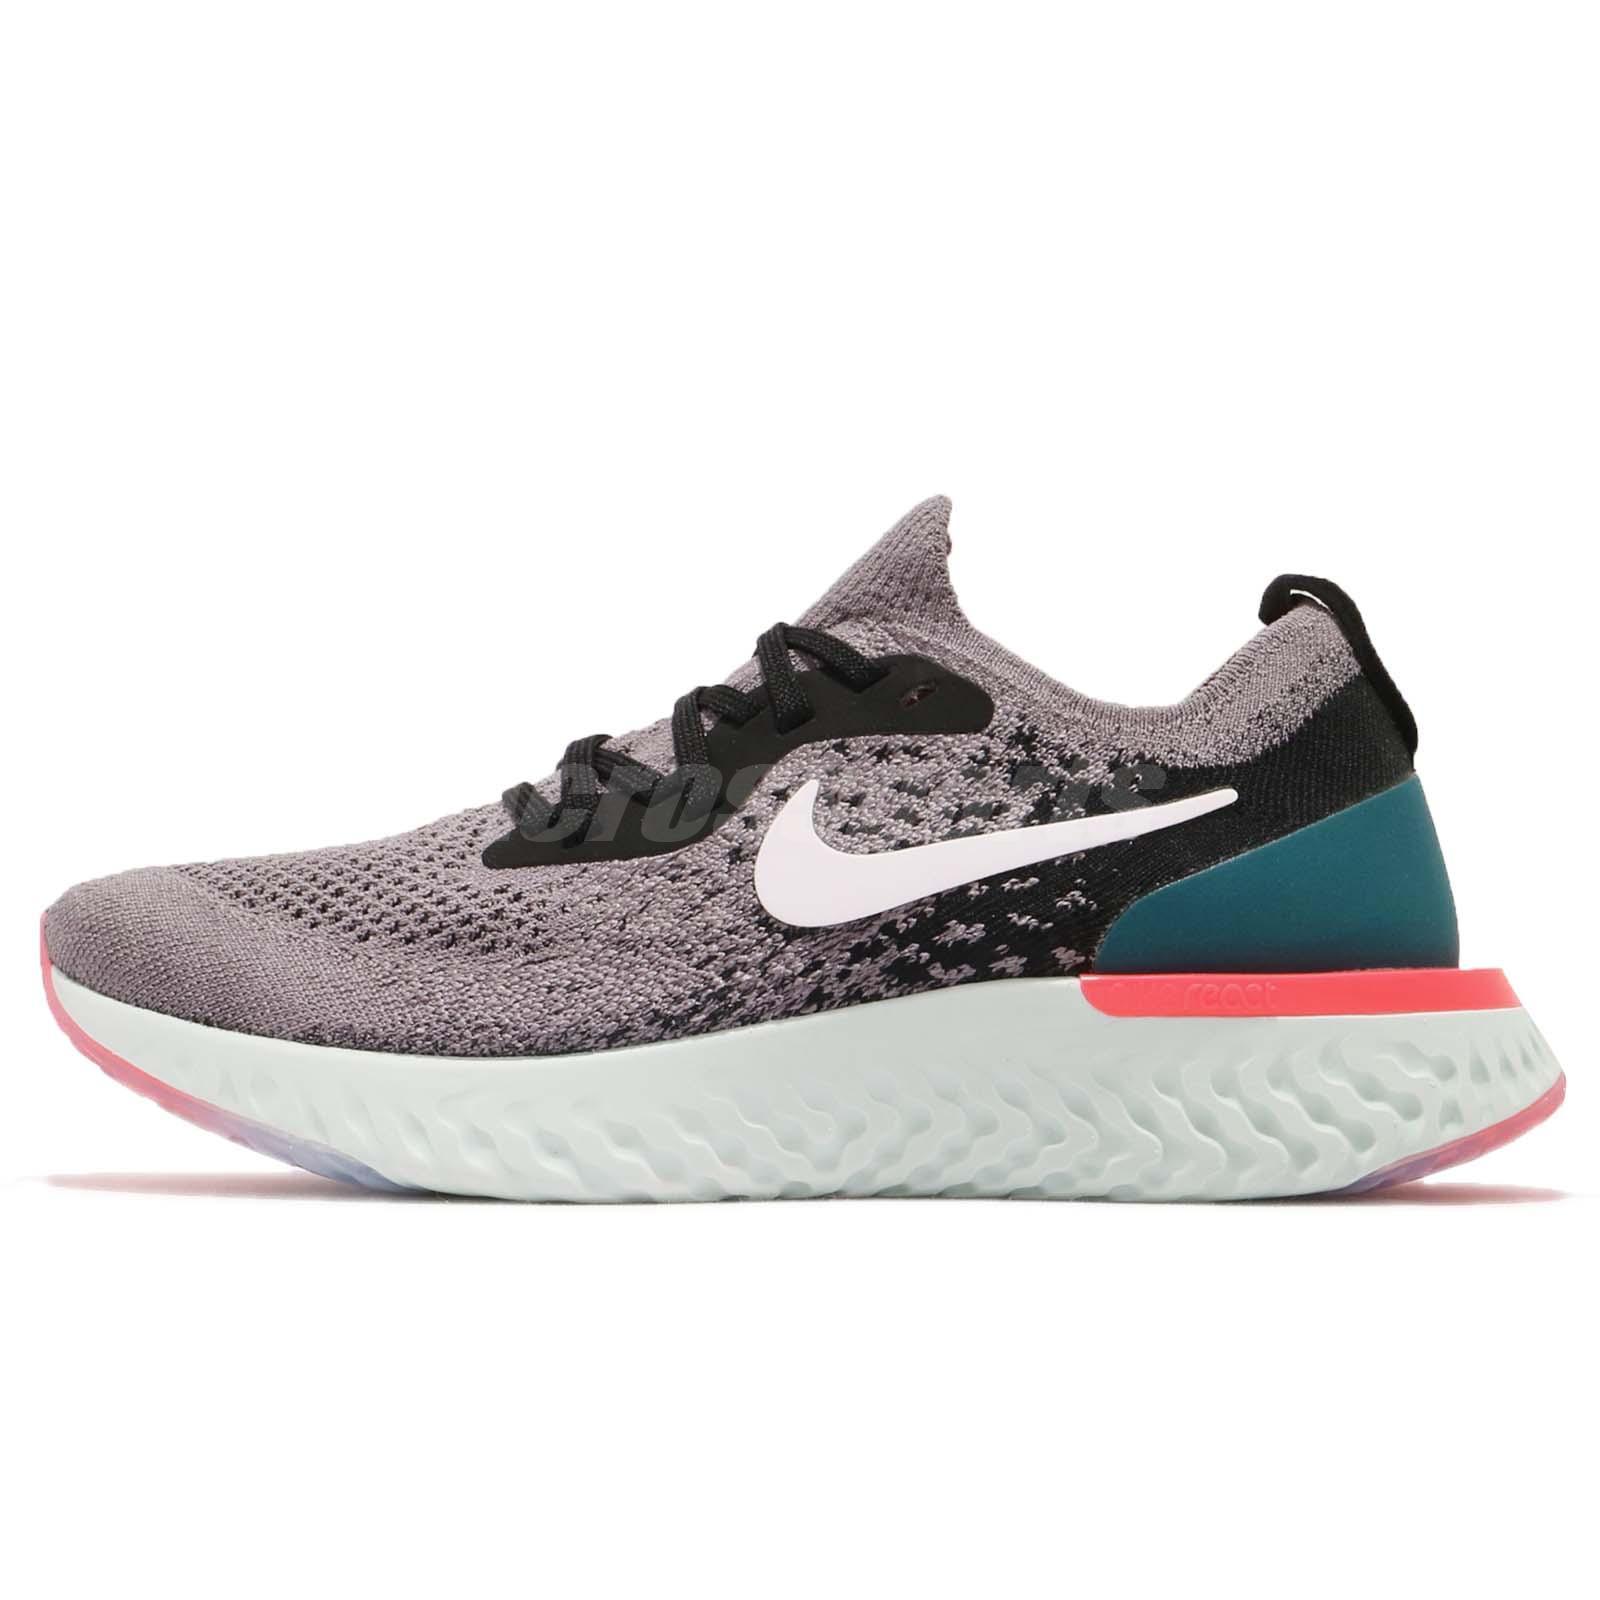 f2baa478cdb89 Nike Wmns Epic React Flyknit Grey Black Green Pink Women Running Shoe AQ0070 -010